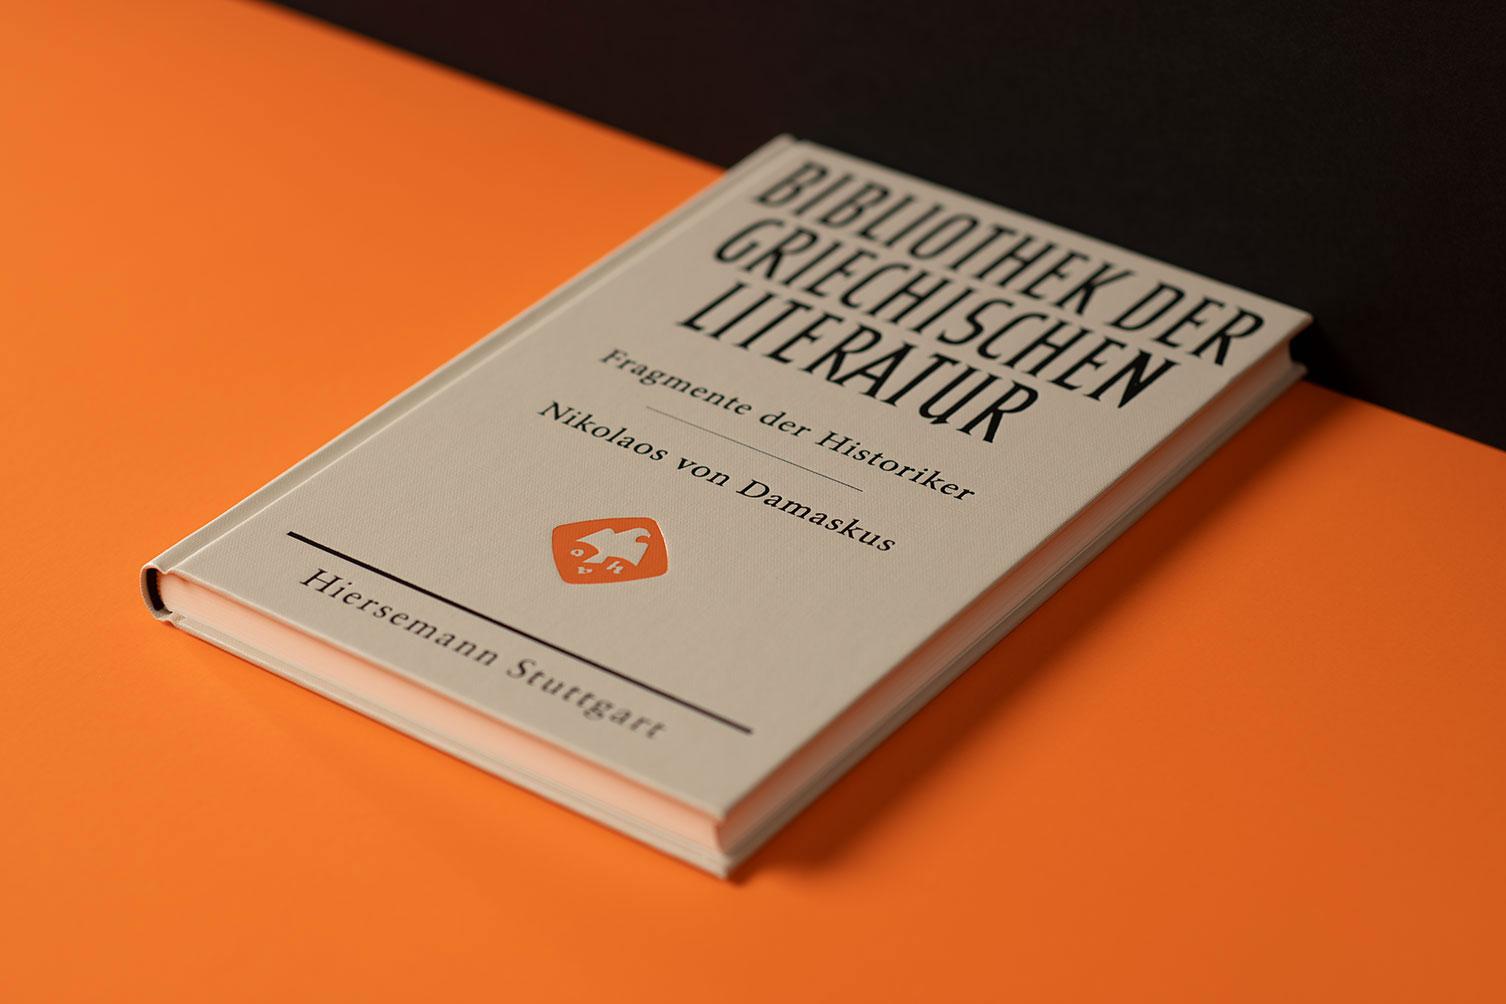 Hiersemann, Hauswedell, Verlag, Stuttgart, Redesign, Logo, Buch